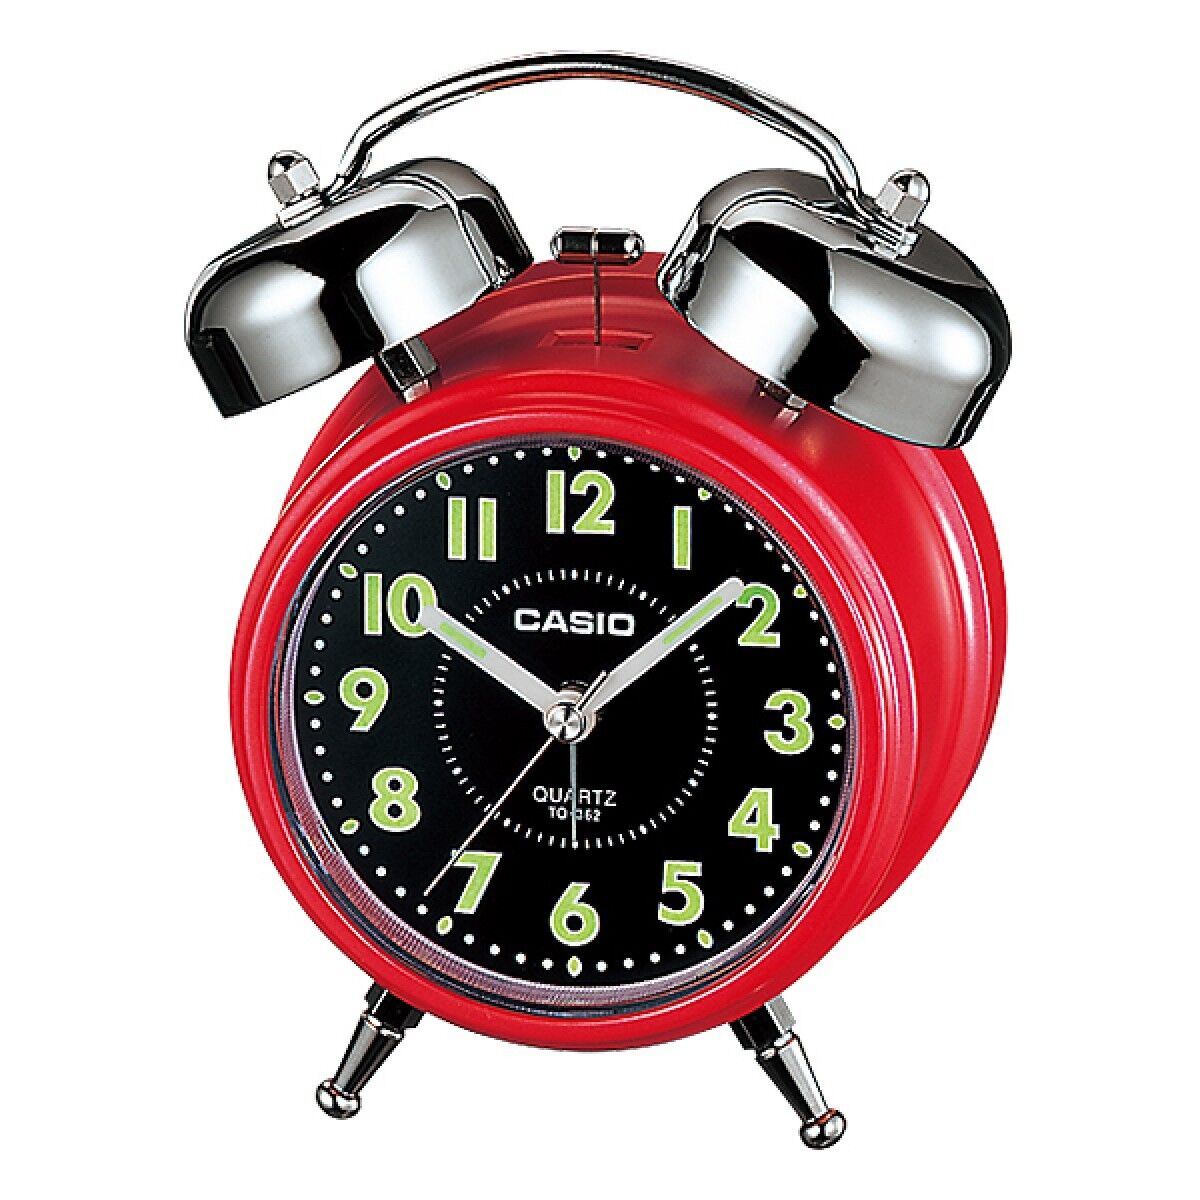 Casio Tq362 4a Red Black Desk Top Bell Snooze Alarm Quartz Clock W Battery